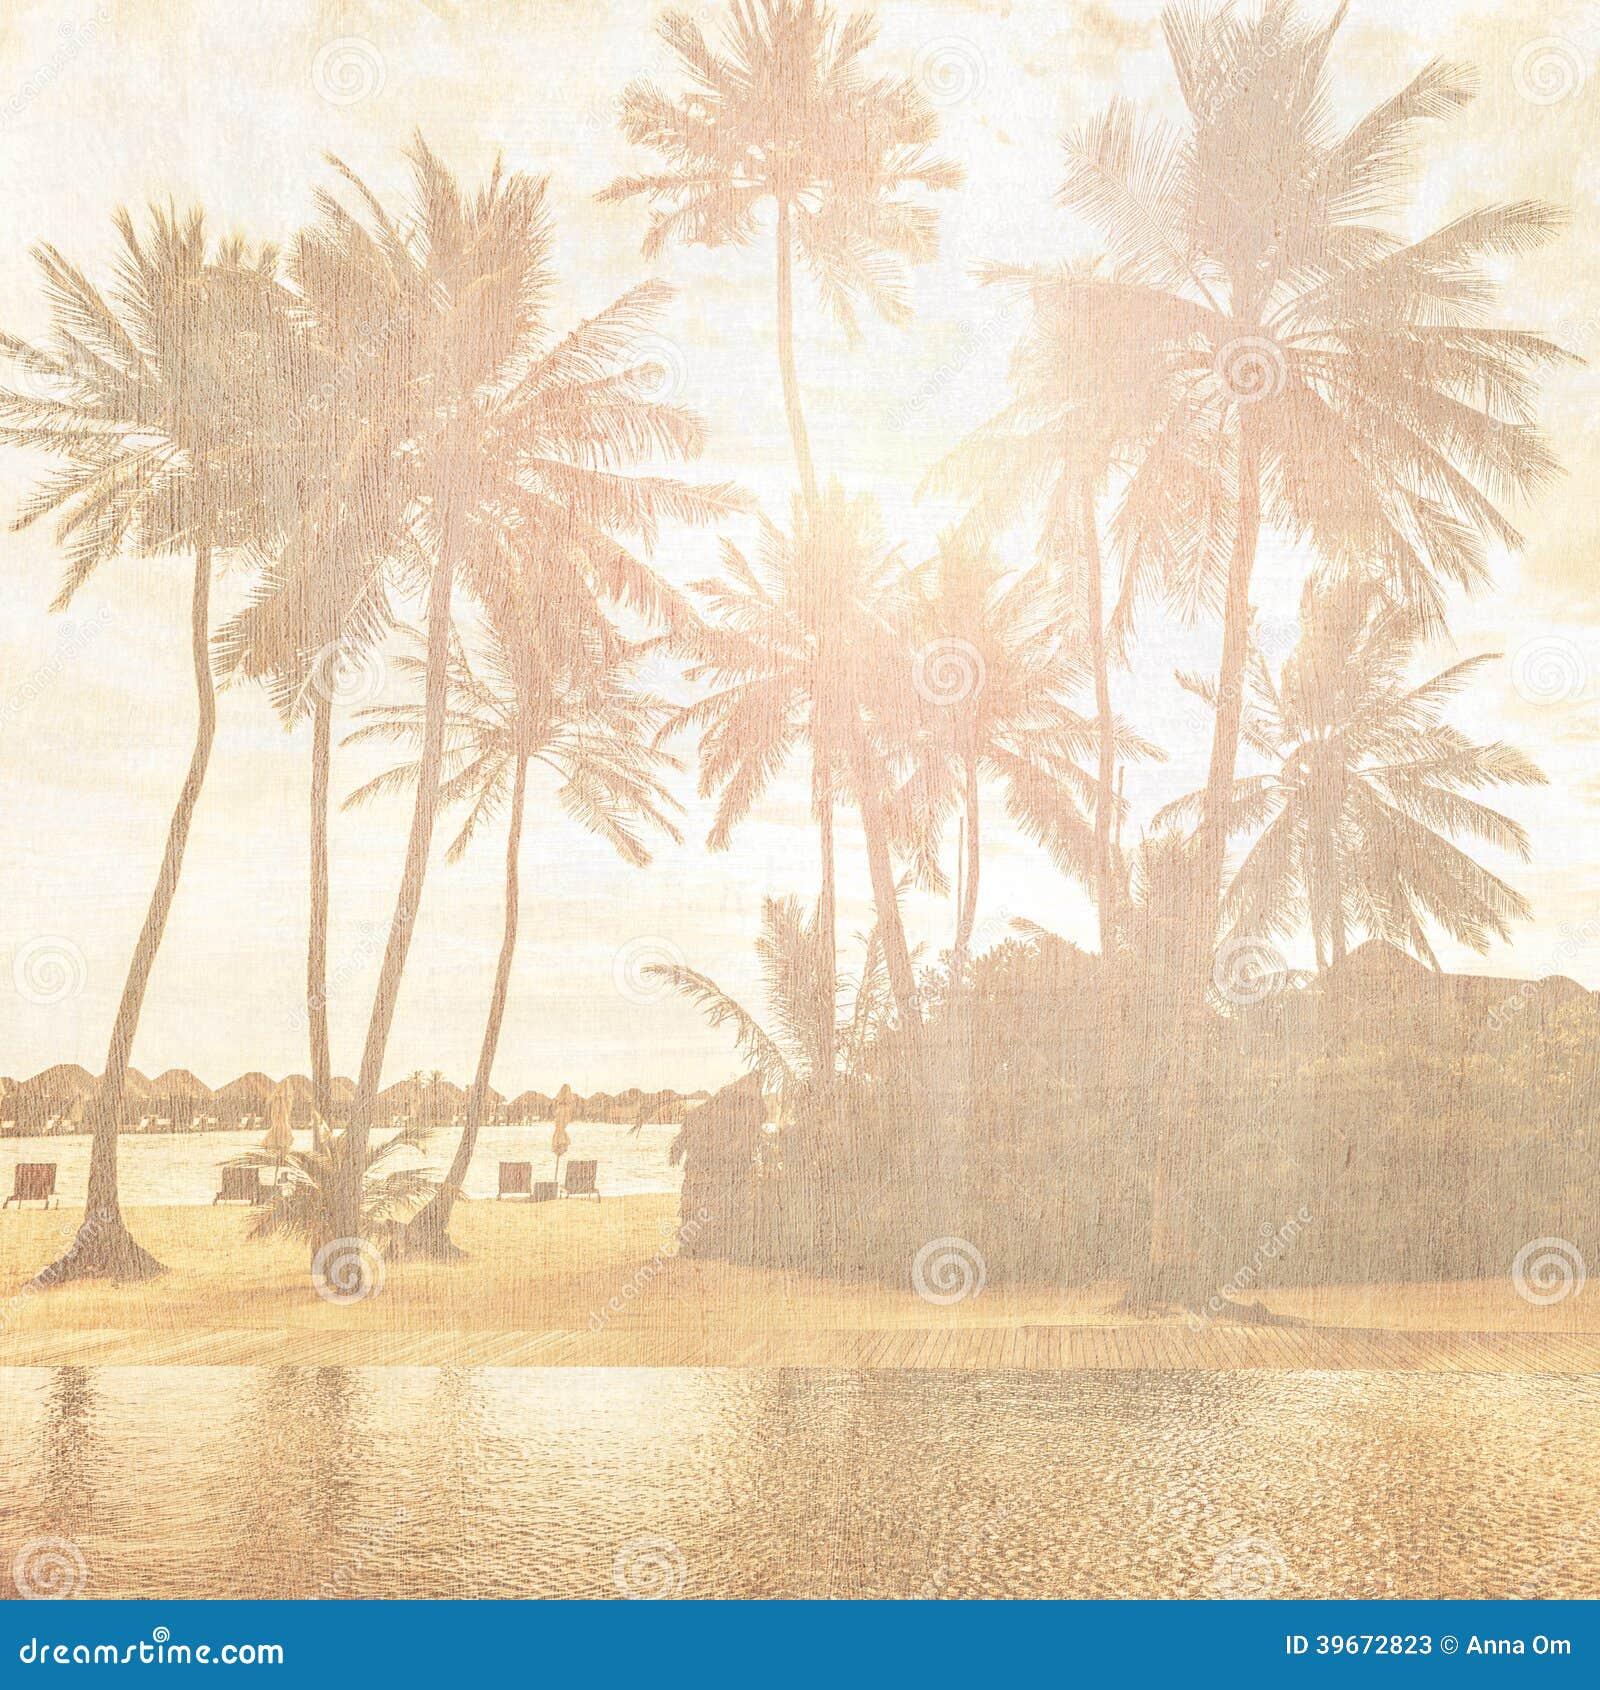 Vintage Beach Background Stock Photo 112981333: Vintage Wallpaper Stock Image. Image Of Holiday, Coastline